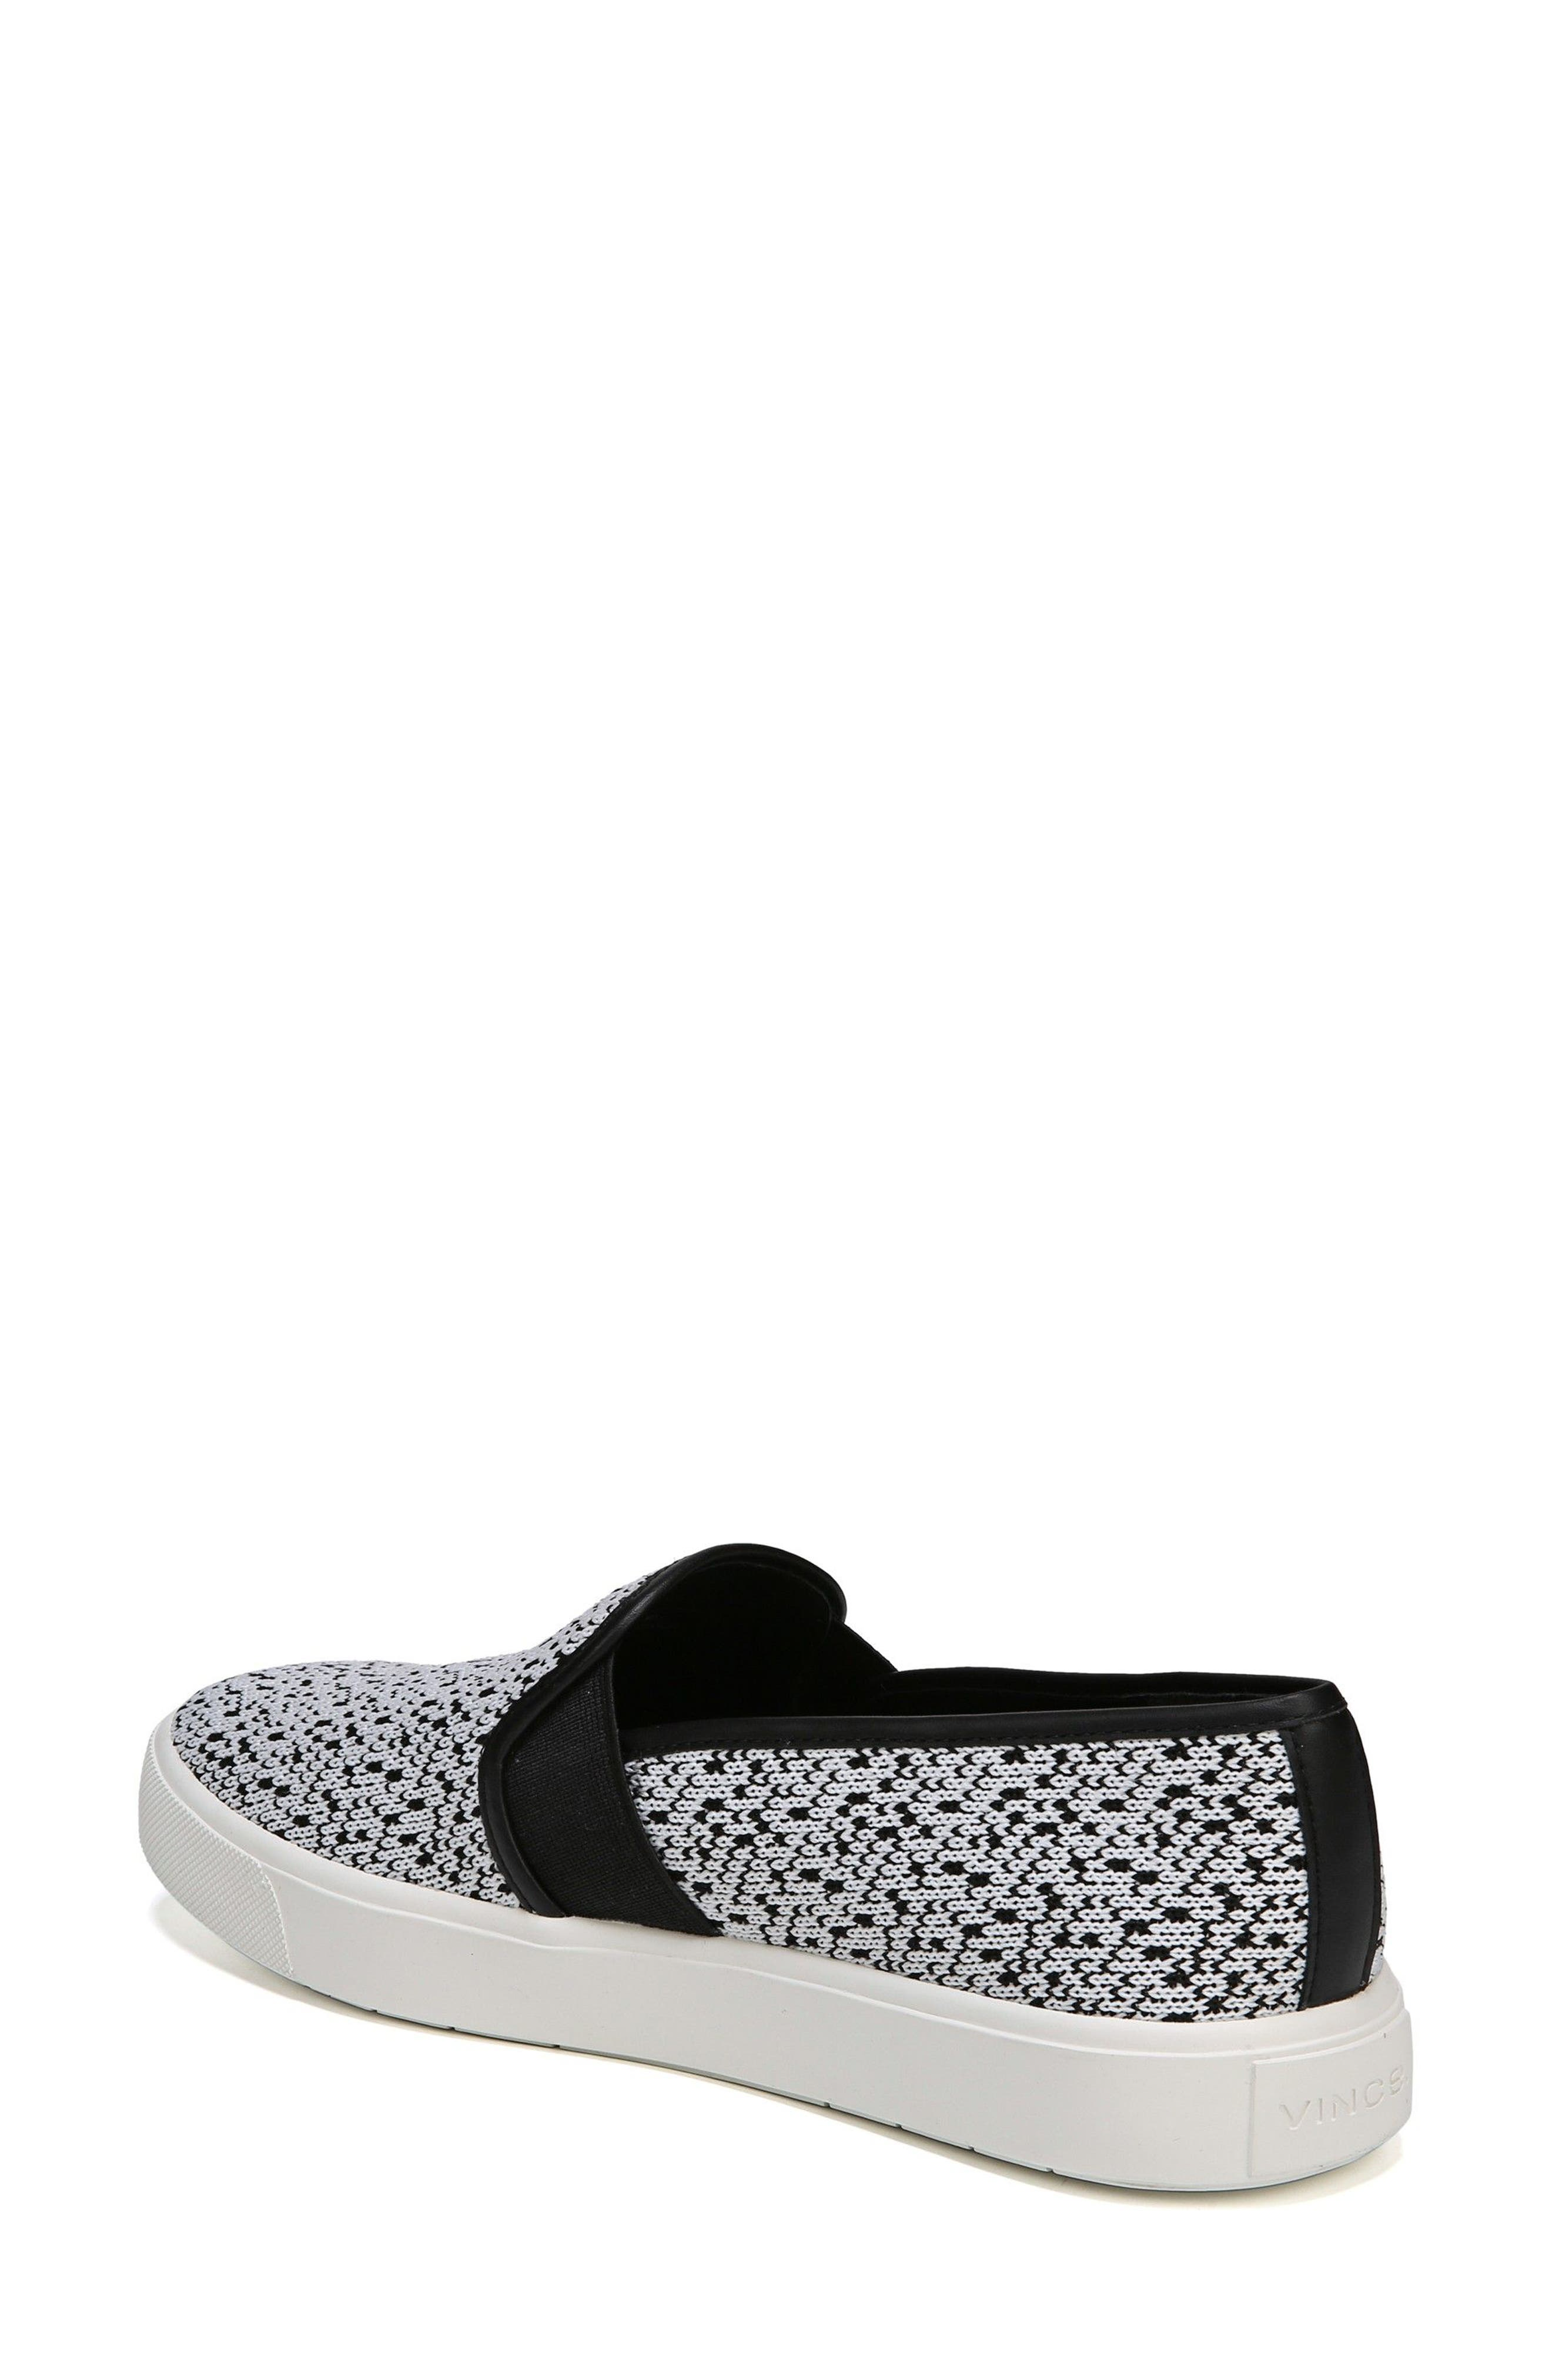 'Blair 12' Leather Slip-On Sneaker,                             Alternate thumbnail 2, color,                             WHITE/ BLACK YETI KNIT